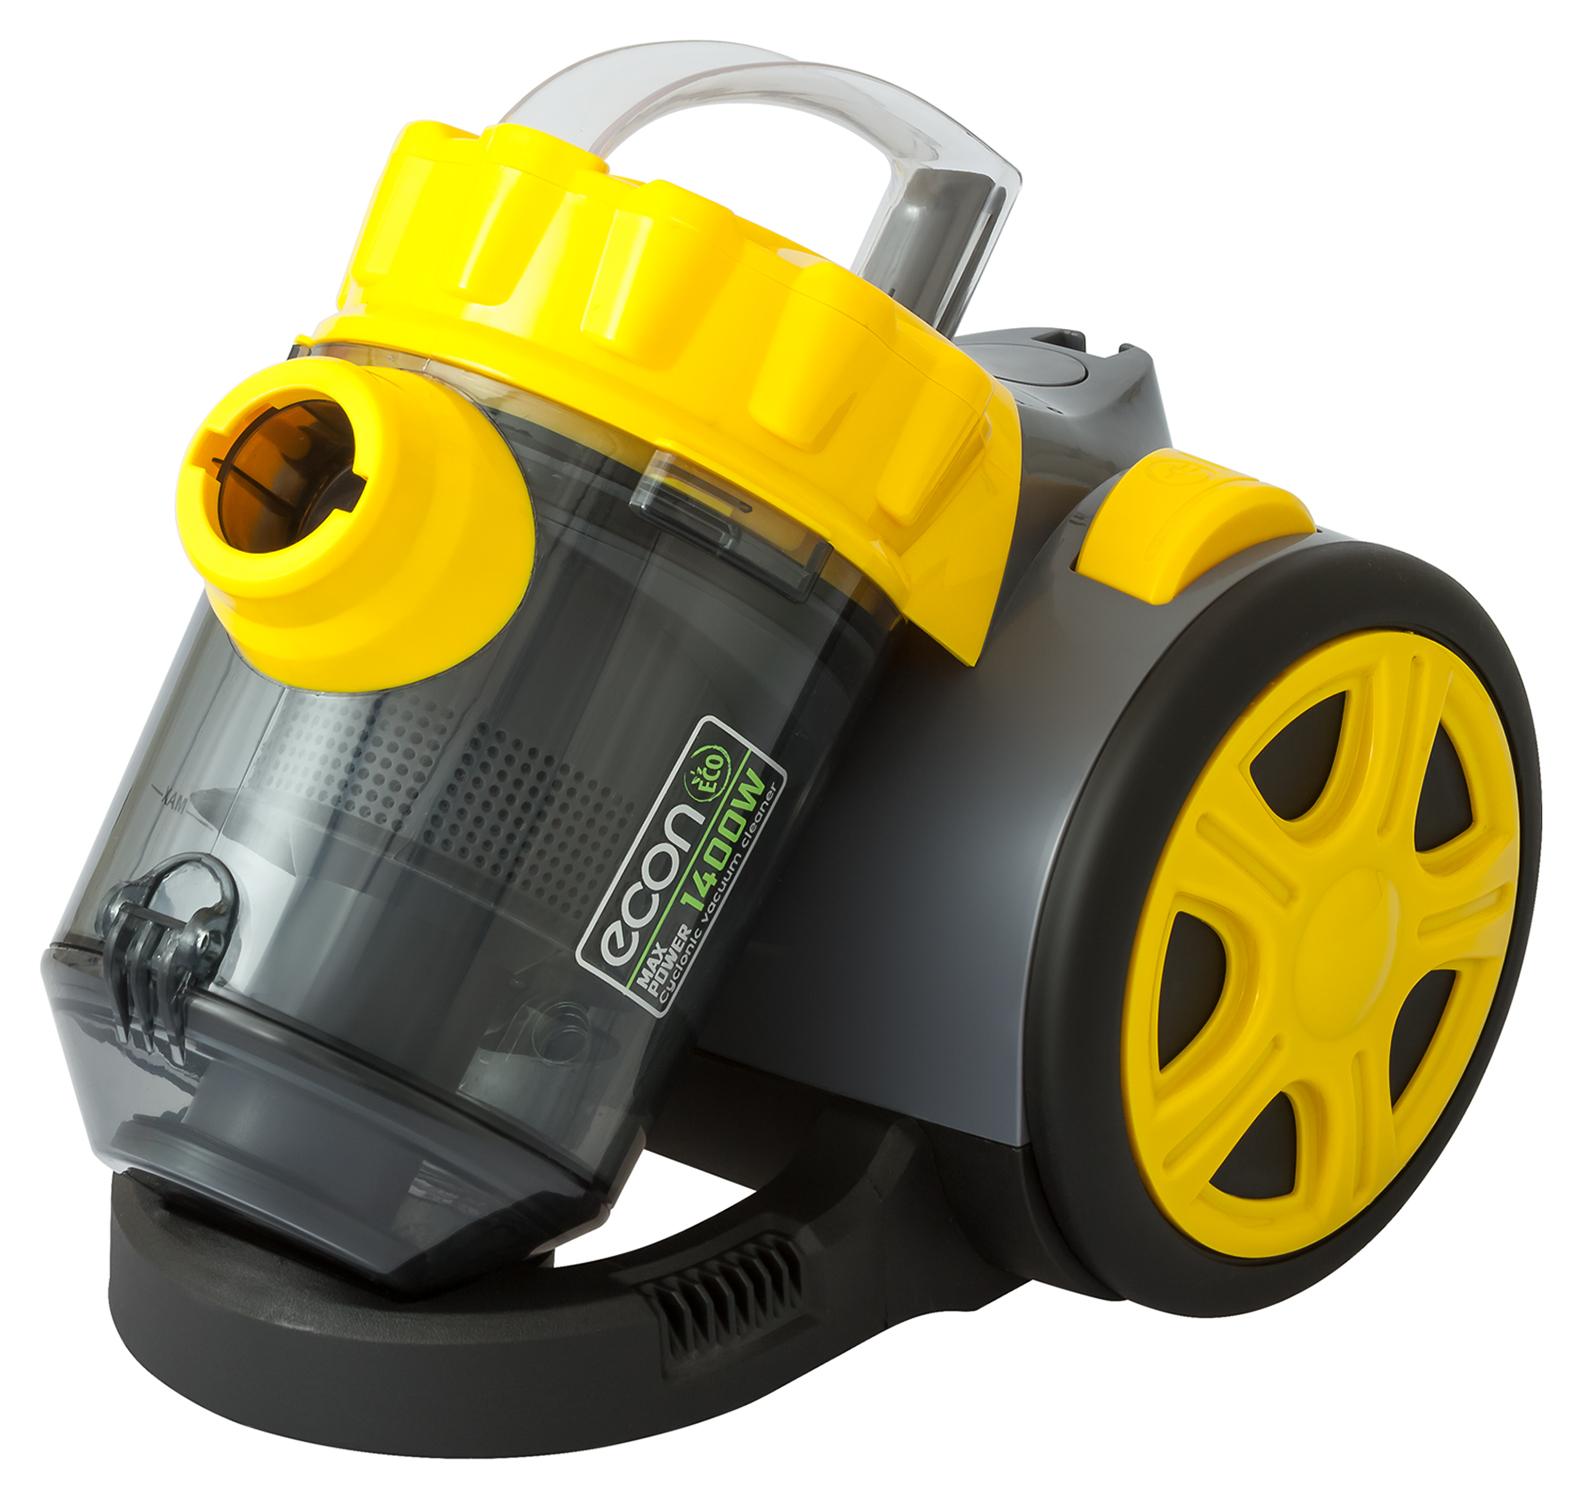 Econ ECO-1440VC Yellow